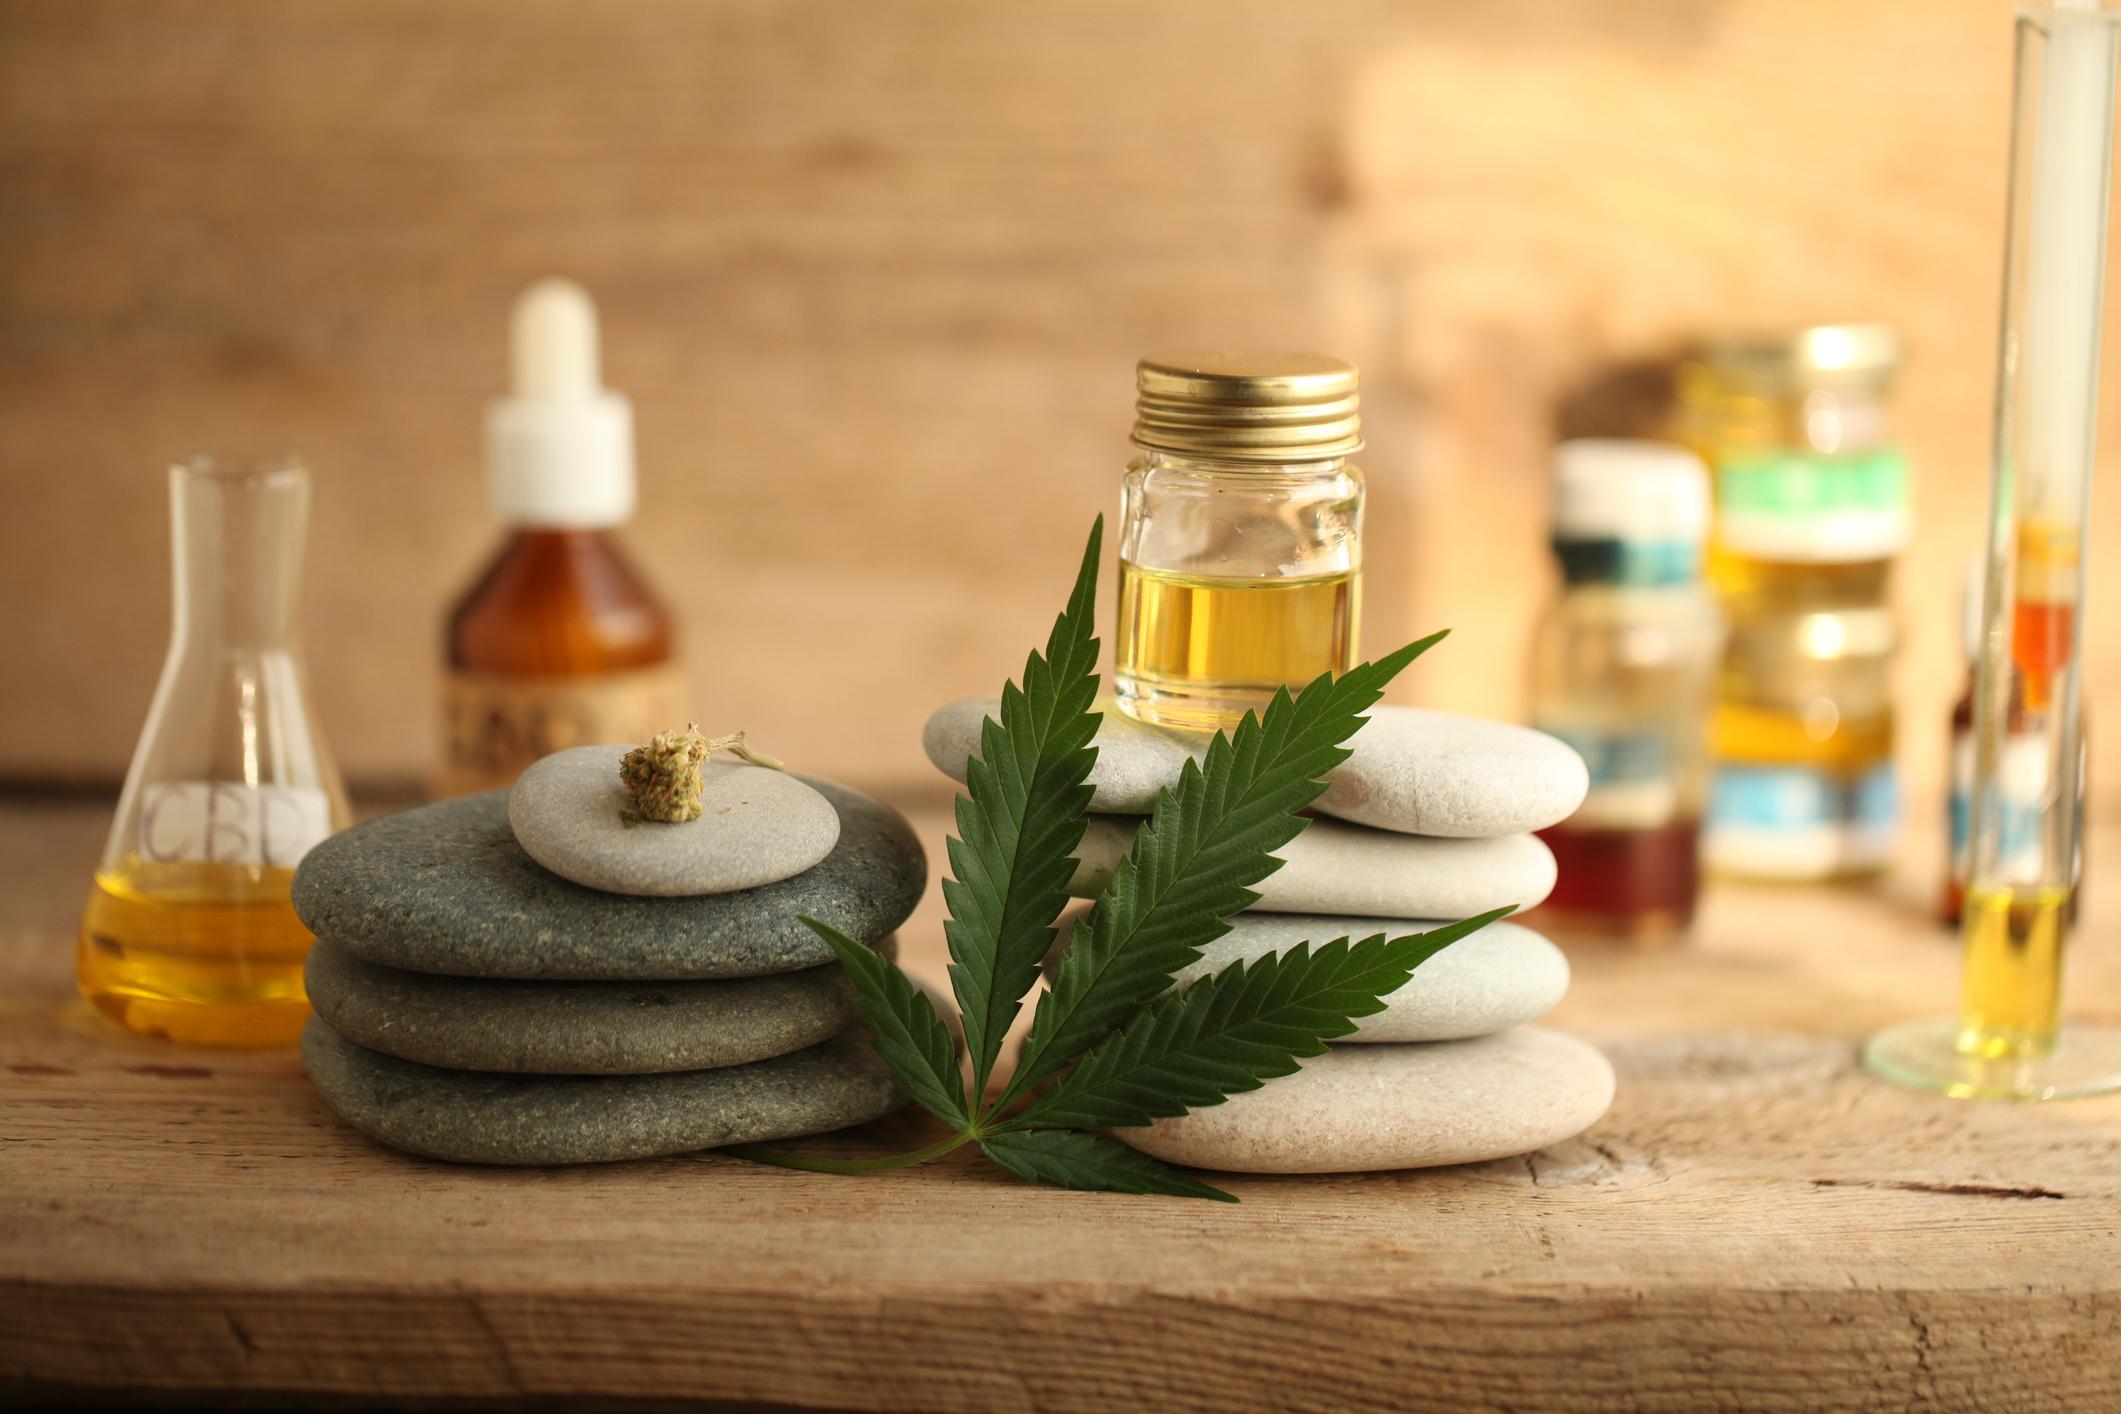 Bottles of cannabidiol oil with marijuana leaf